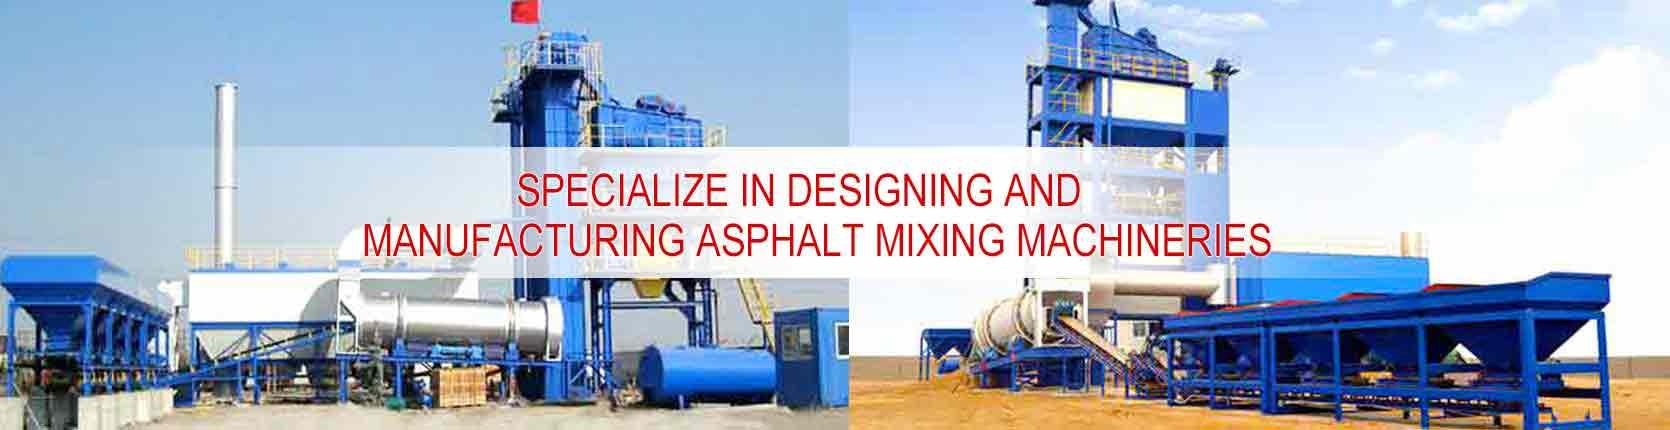 Asphalt Batch Mix Equipment for Sale in AIMIX